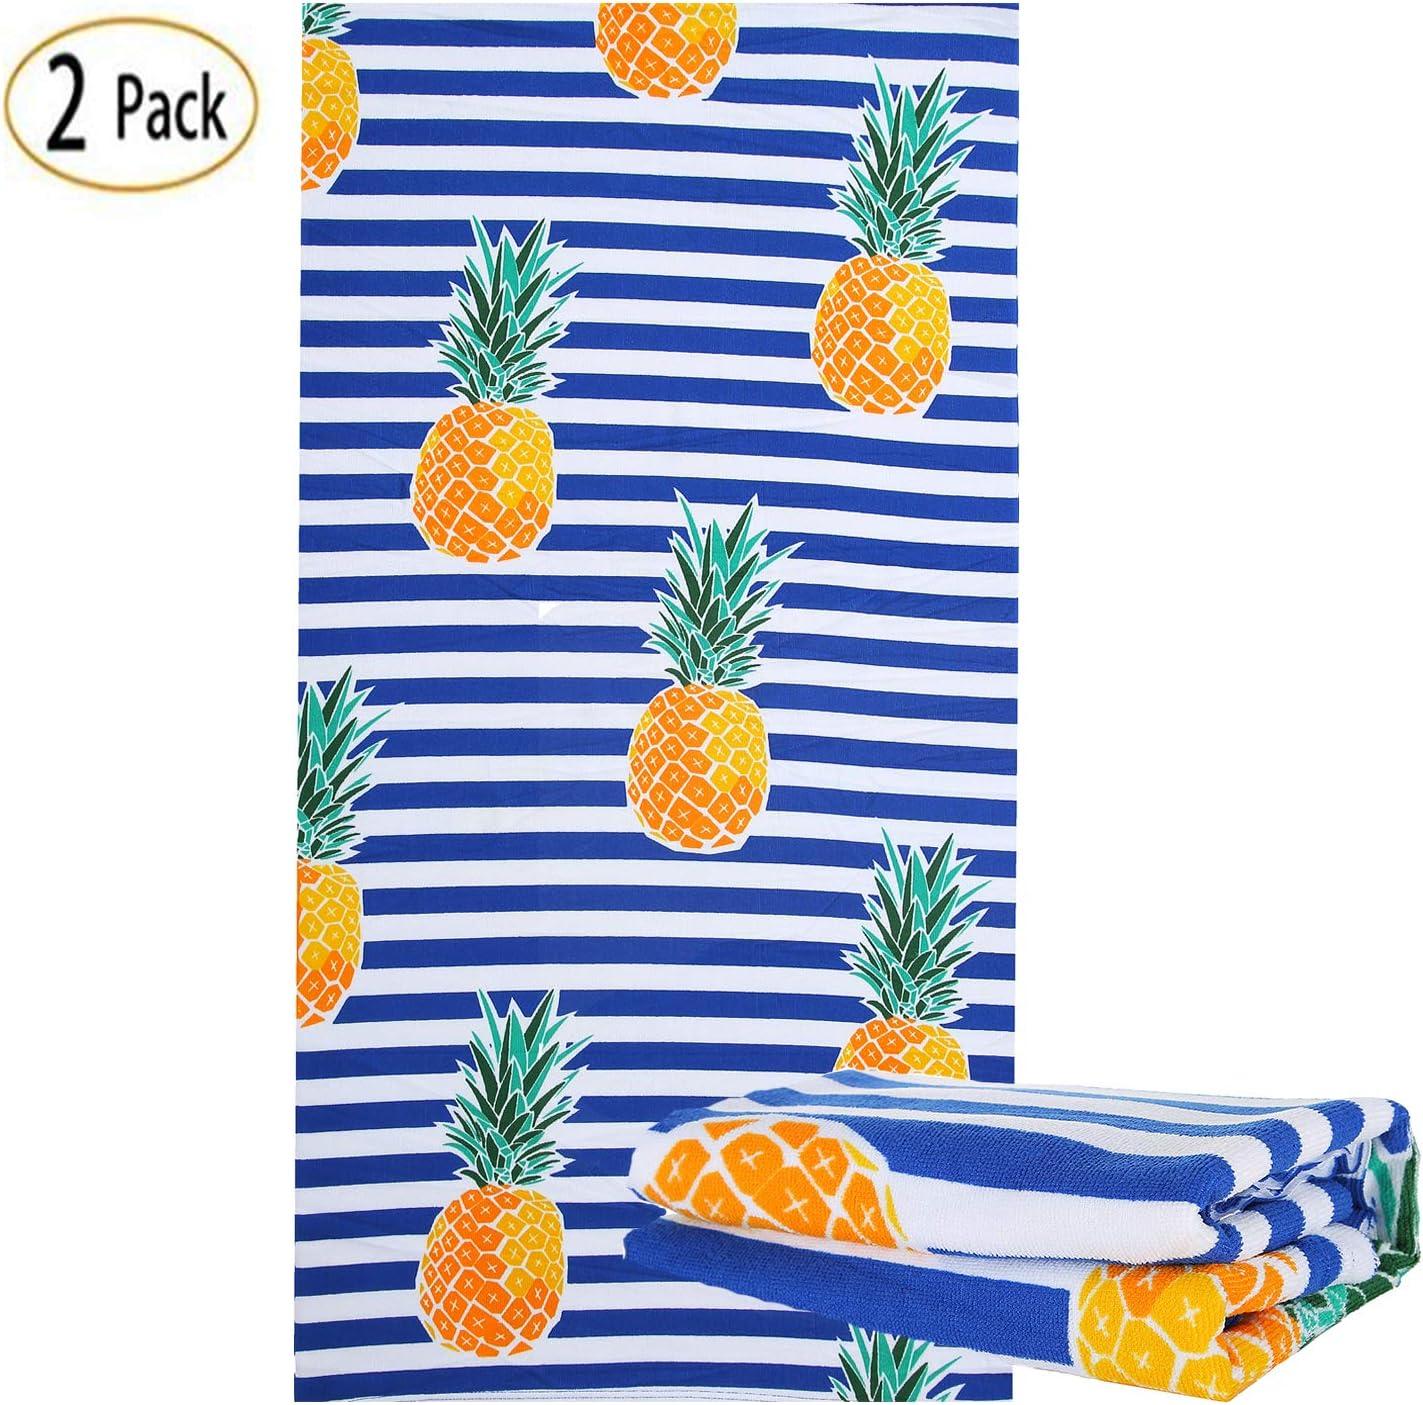 Super Absorbent Quick Dry Bath Towel for Children Pink 30x 61 Kids Beach Blanket Pool Towel for Travel NovForth Microfiber Beach Towel for Women Girls